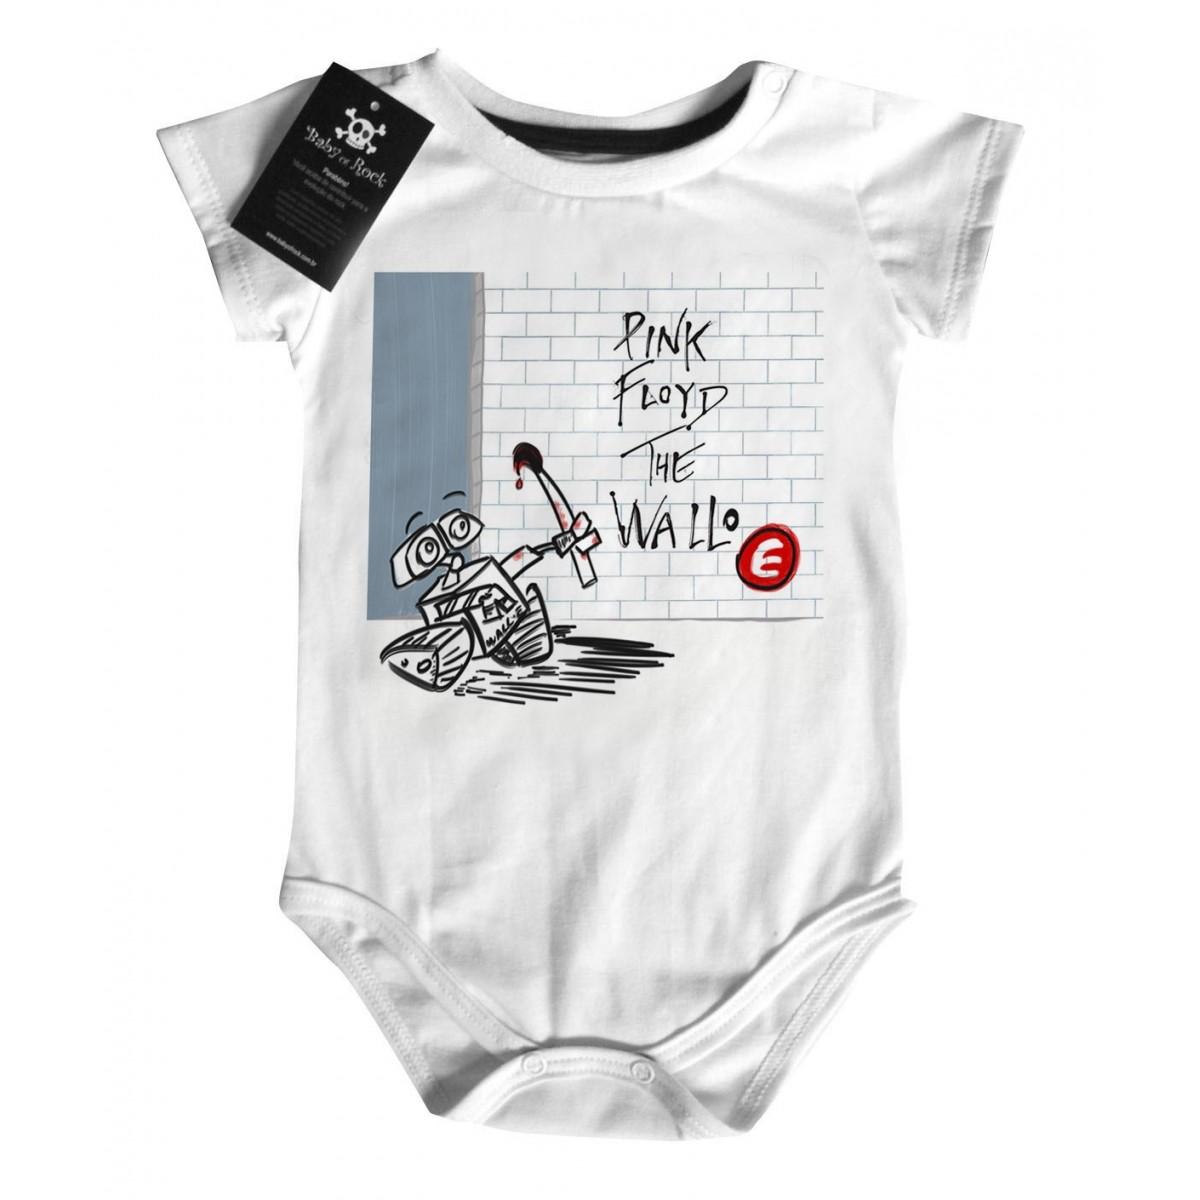 Camiseta  Bebê Rock - The Wall-e Floyd - White  - Baby Monster - Body Bebe